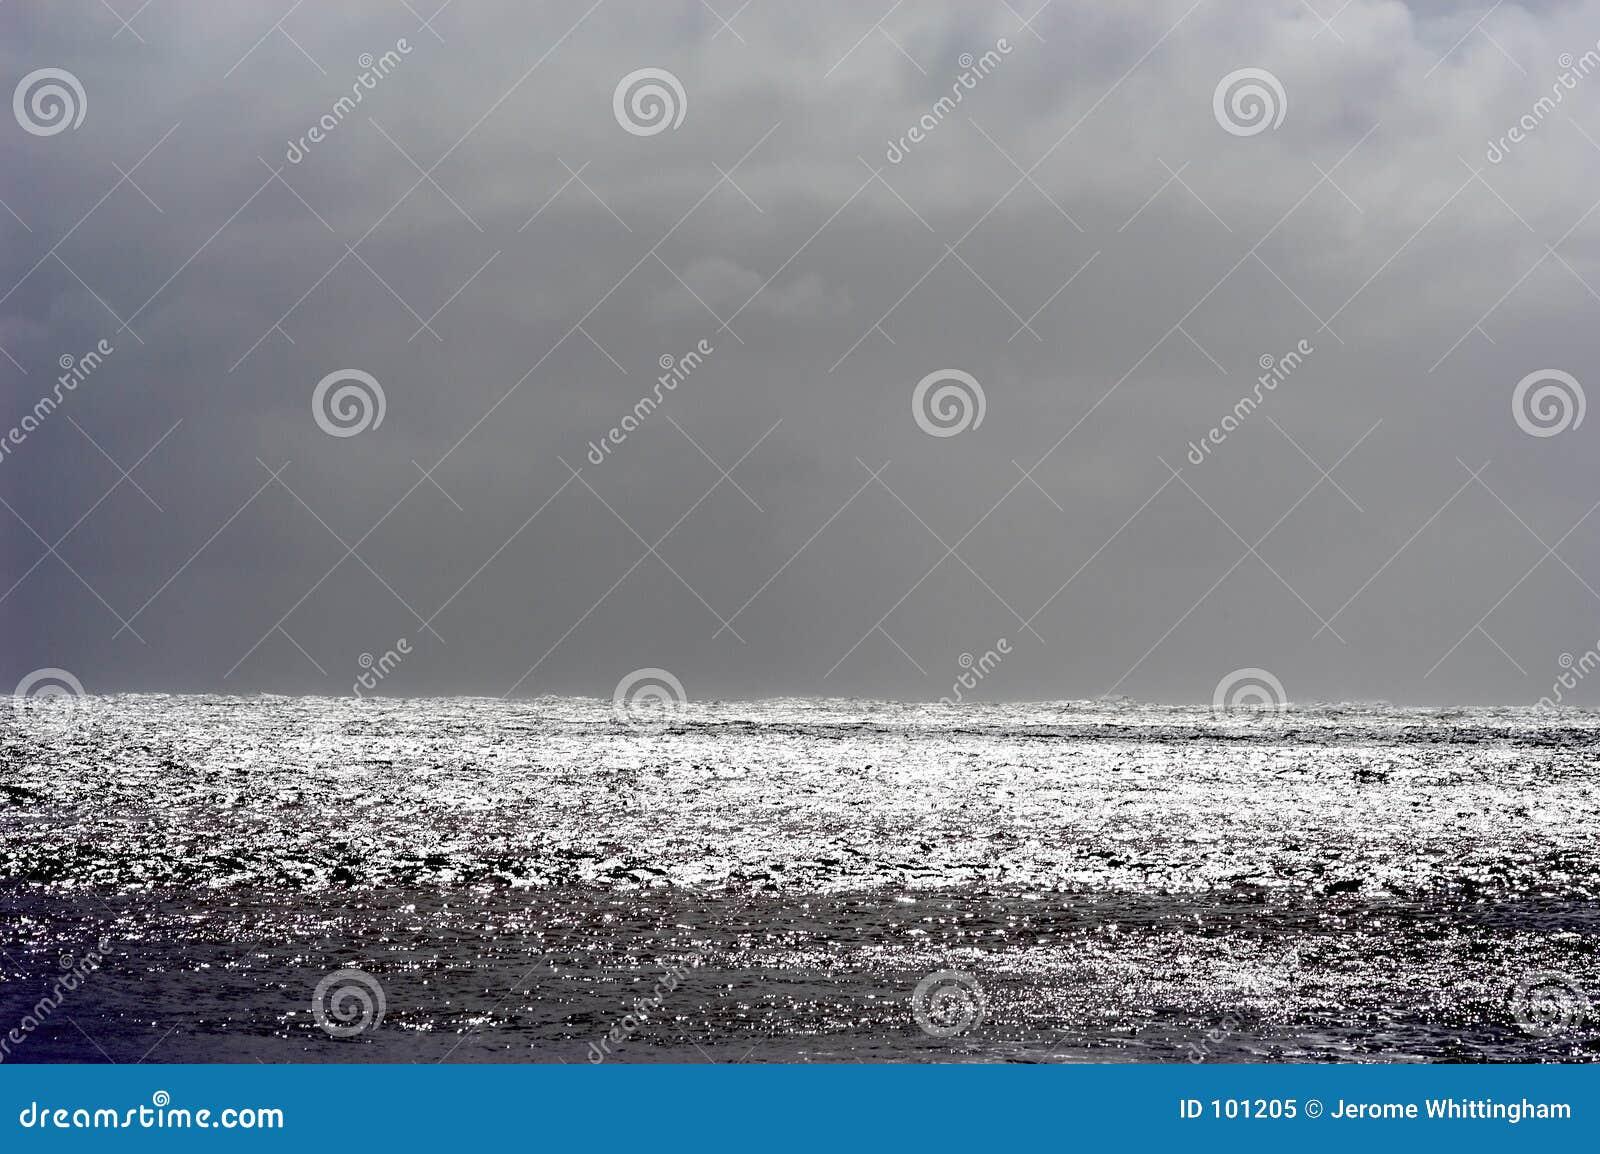 Stormy seascape, horizontal